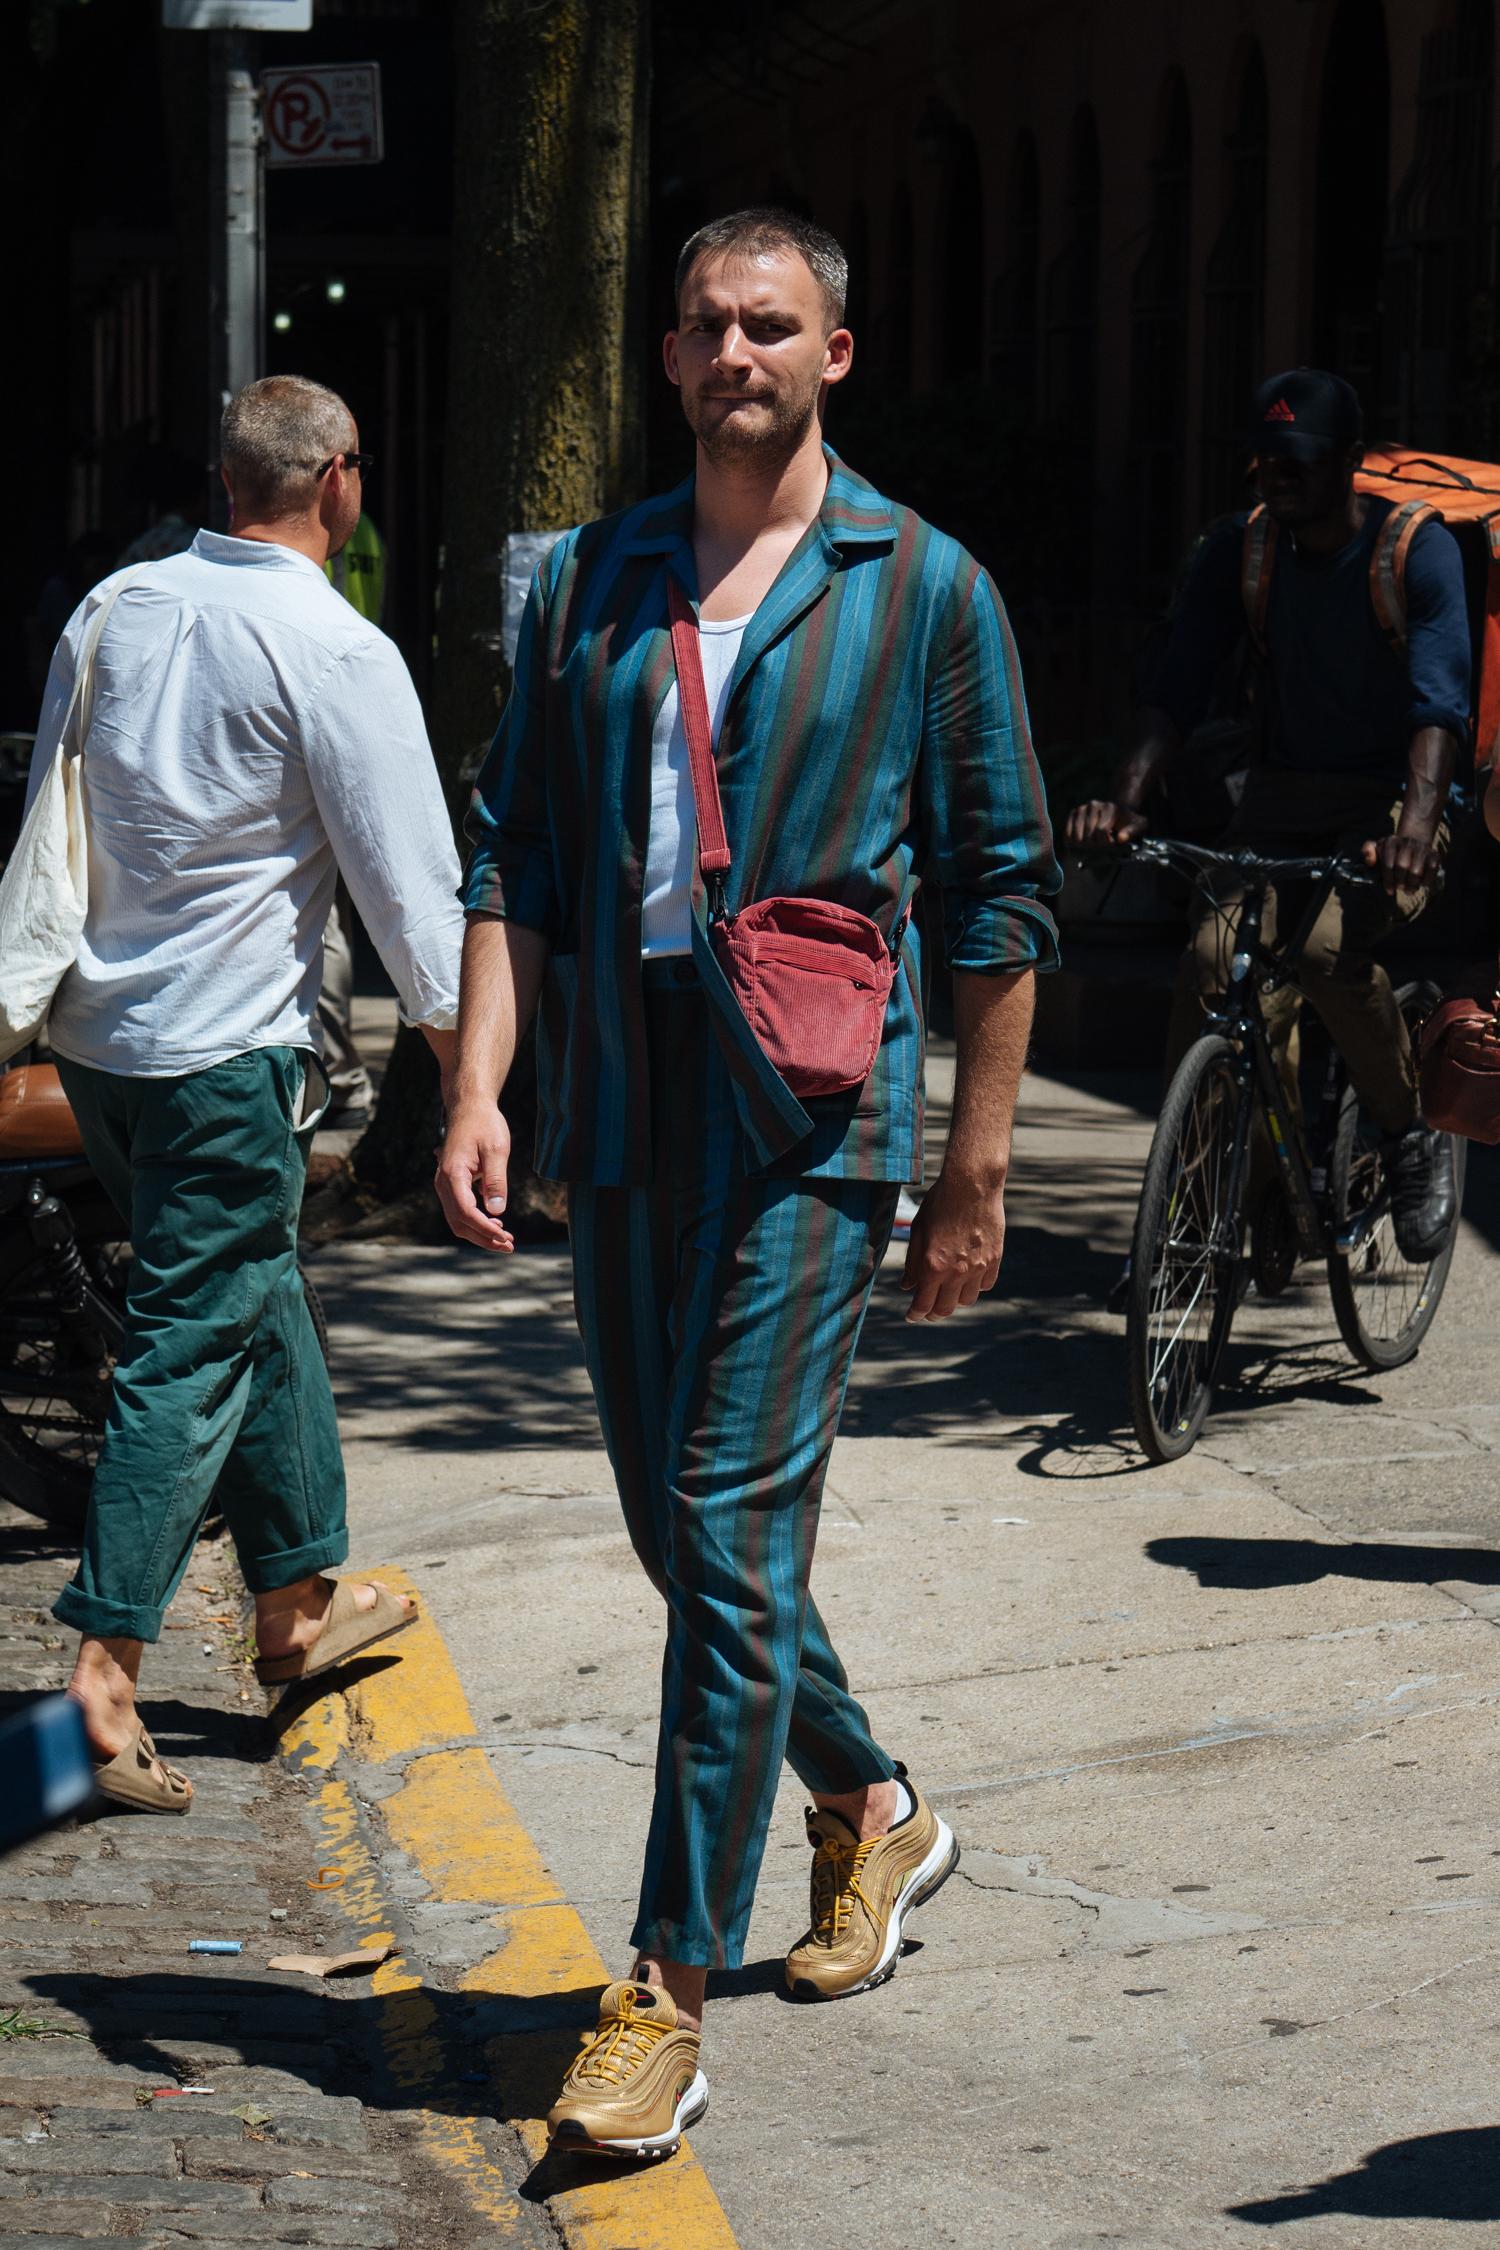 Stripes at  New York Fashion Week: Men's . Captured on my  Olympus OM-D E-M1 II  with a  M.ZUIKO PRO 45mm F1.2 lens.